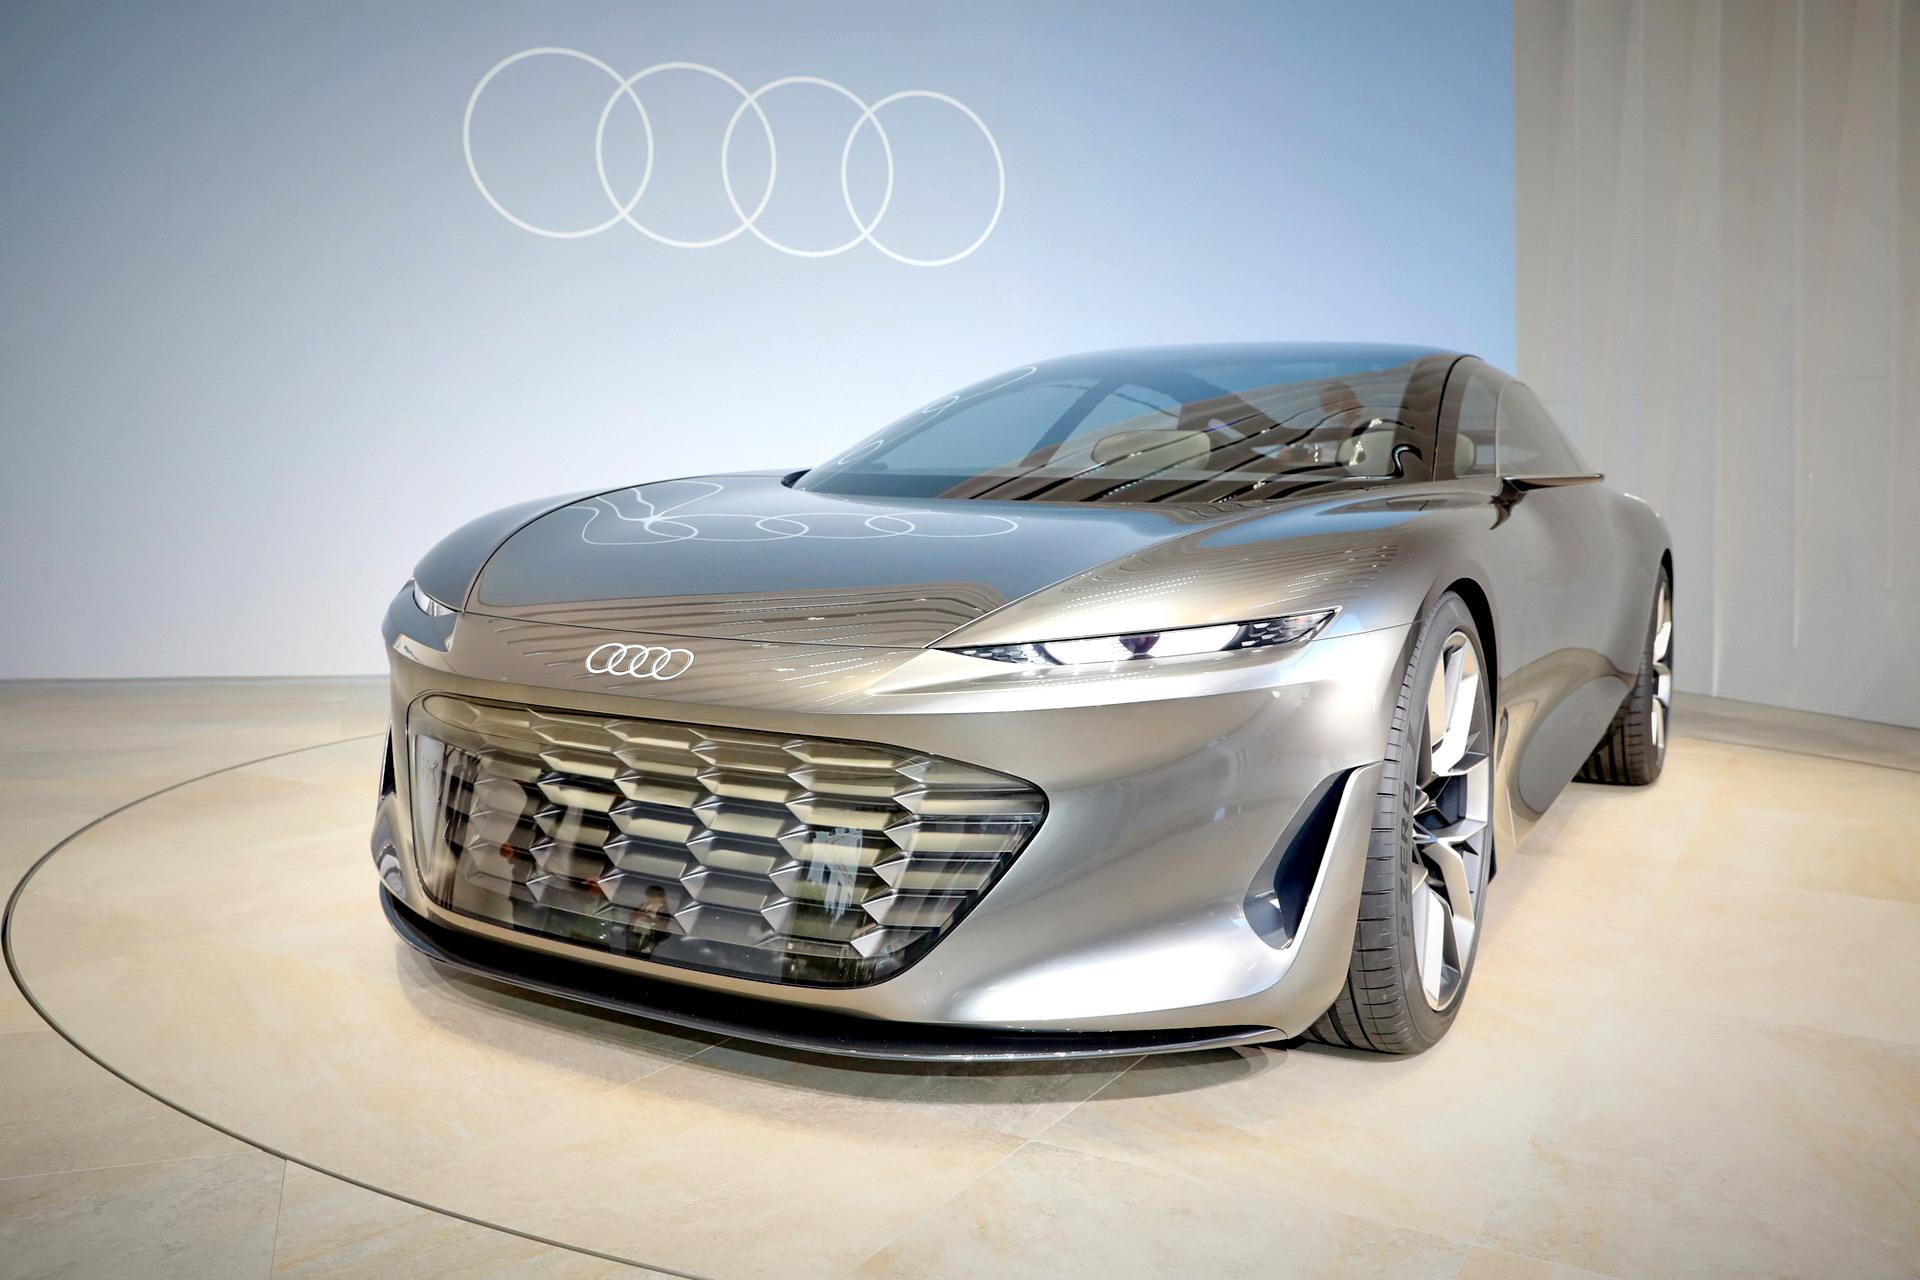 Audi-GrandSphere-Concept-A8-41.jpg